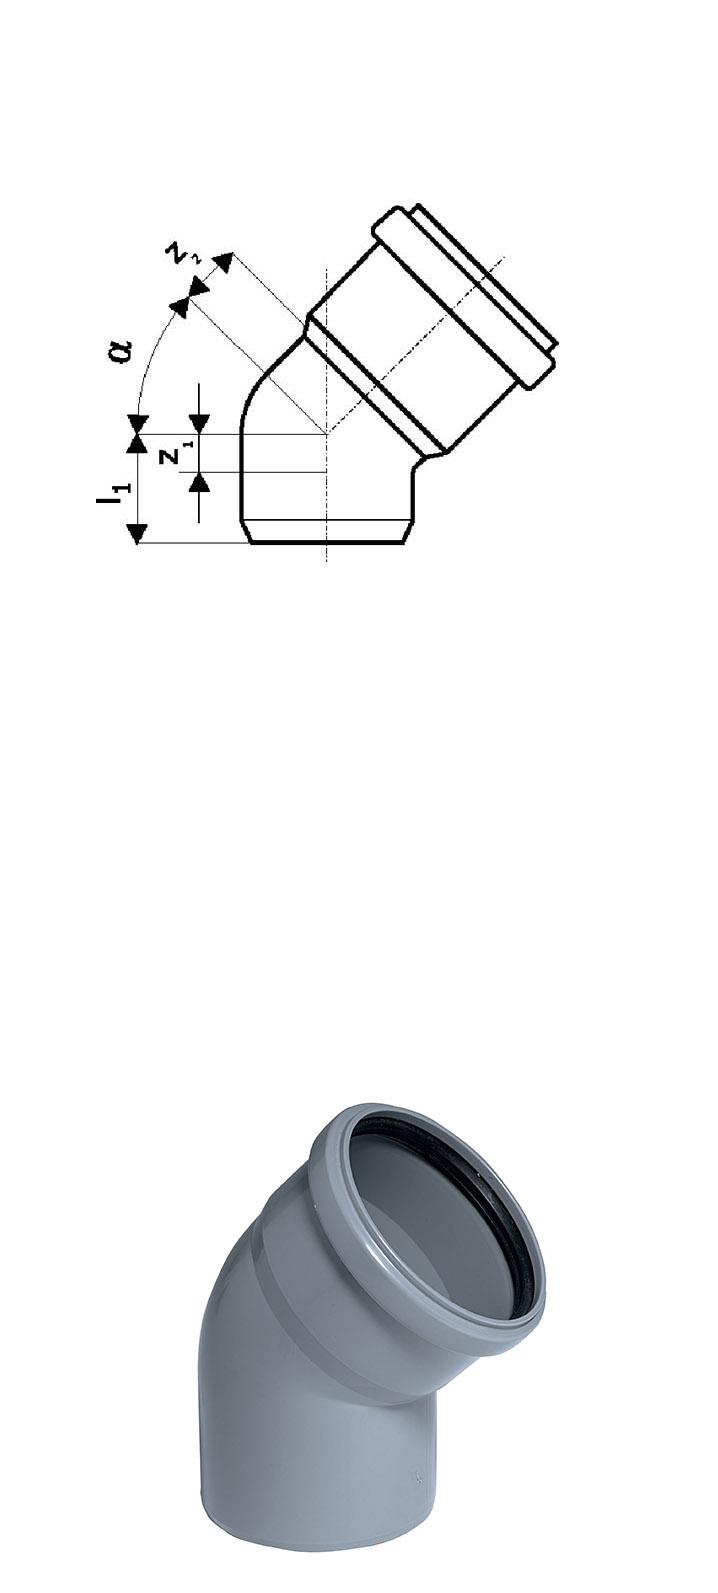 HTB отвод - htb-otvod-32-15 - gebr-ostendorf-osma-s-r-o - 0-02 - 20 - czech-republic